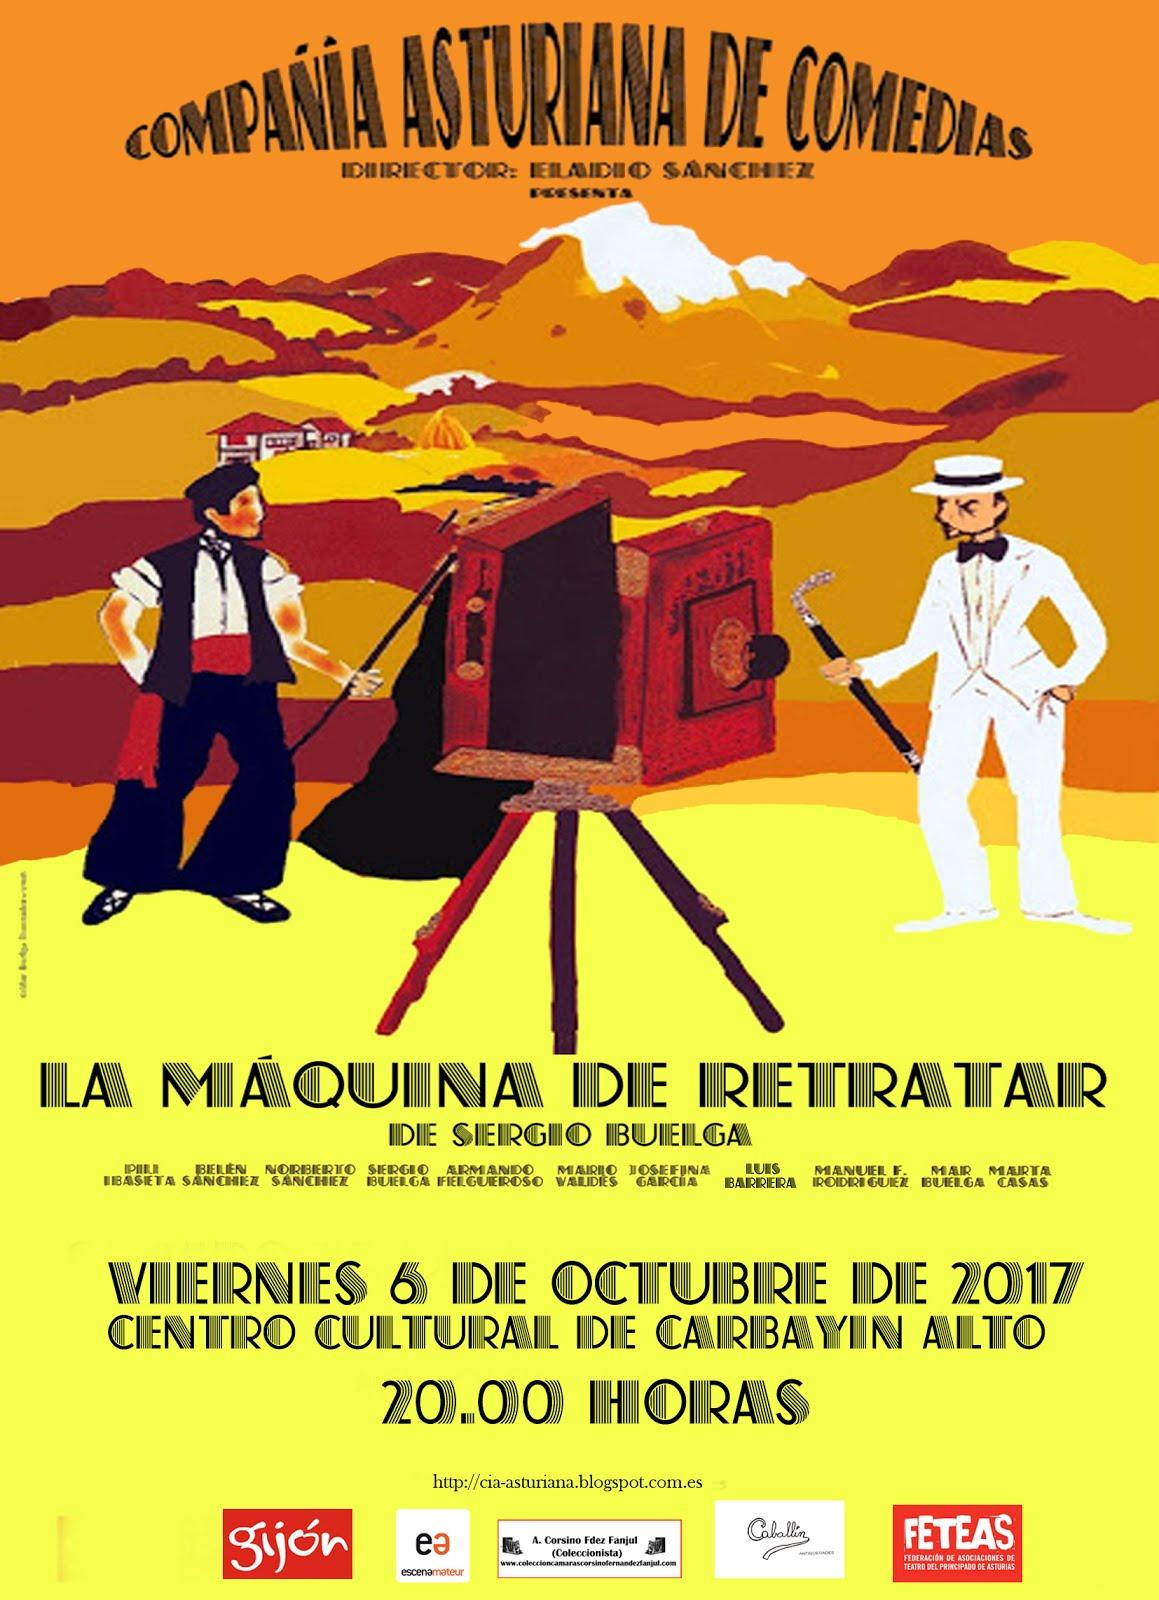 6 de octubre.Centro Cultural de Carbayín alto. 20.00 horas